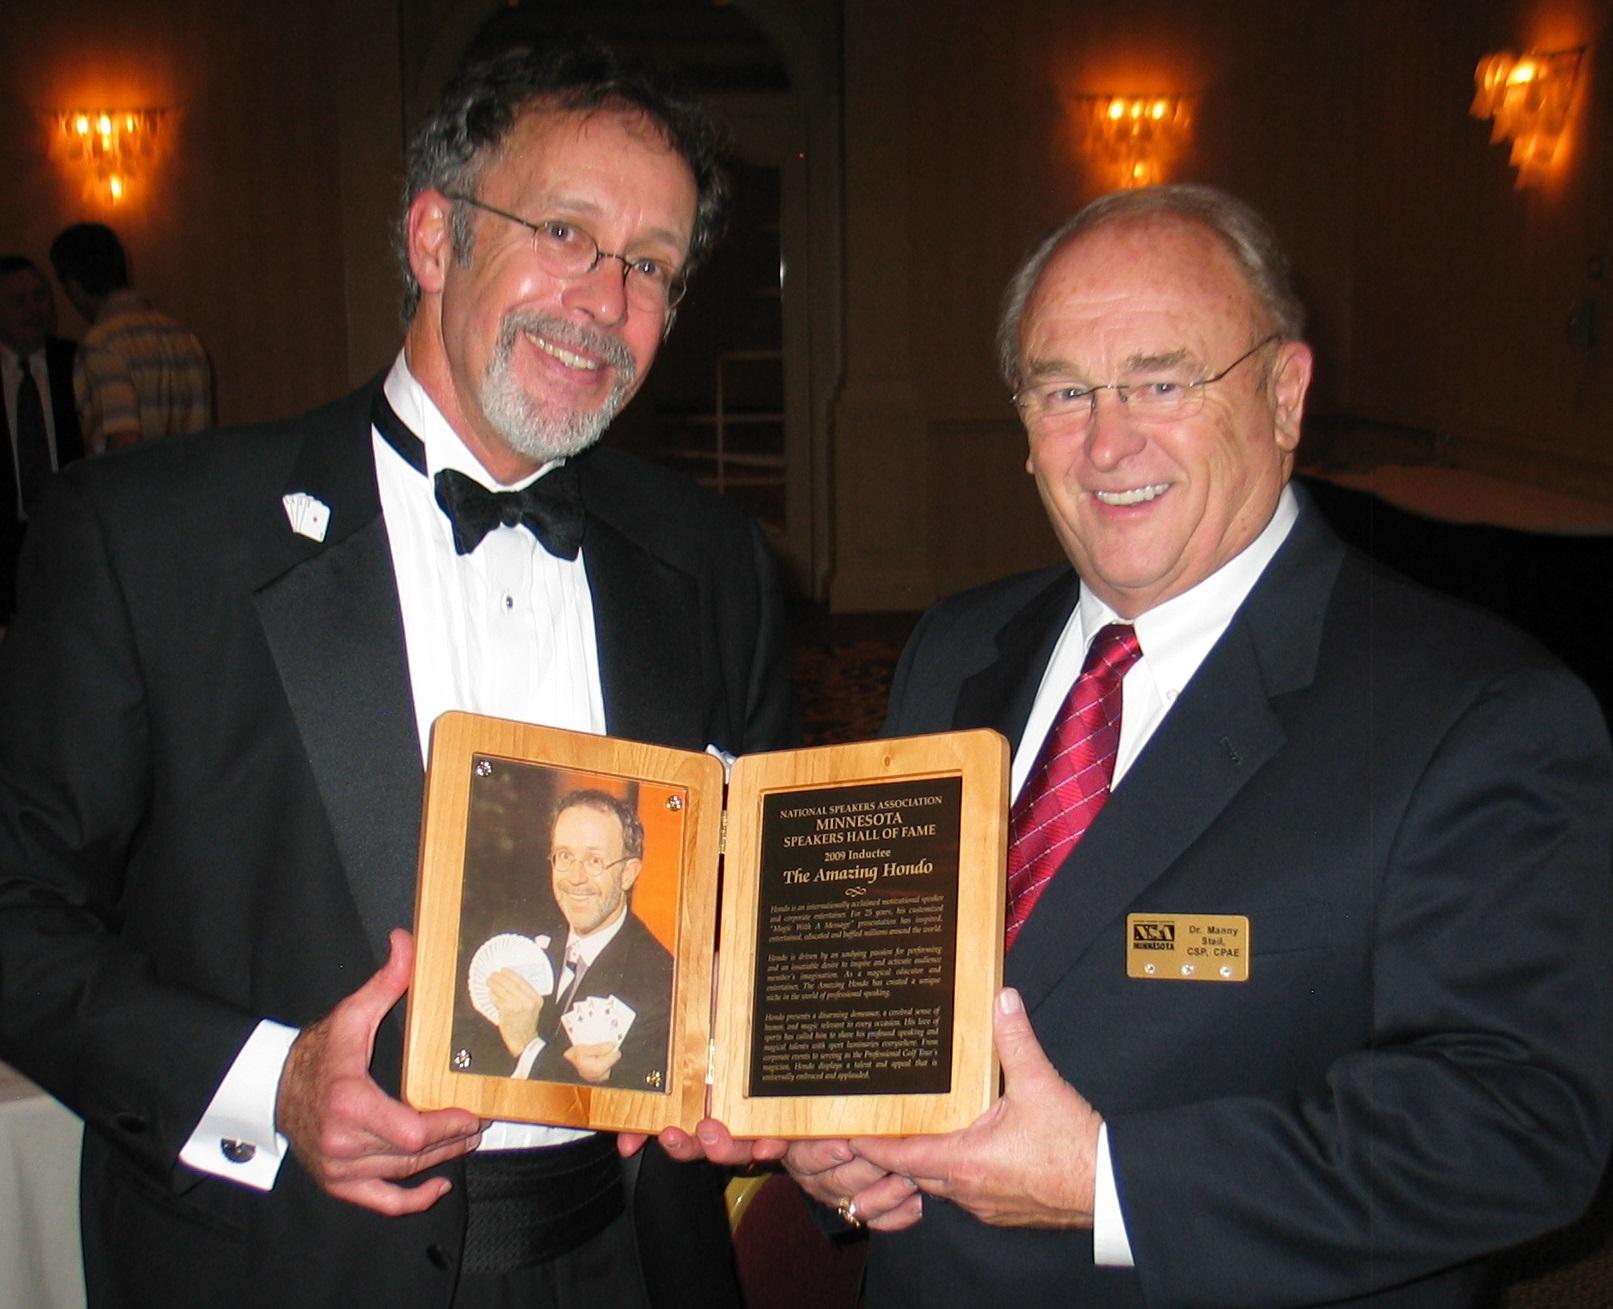 Hondo @ Manny Steil HOF Award NSA-MN.jpg